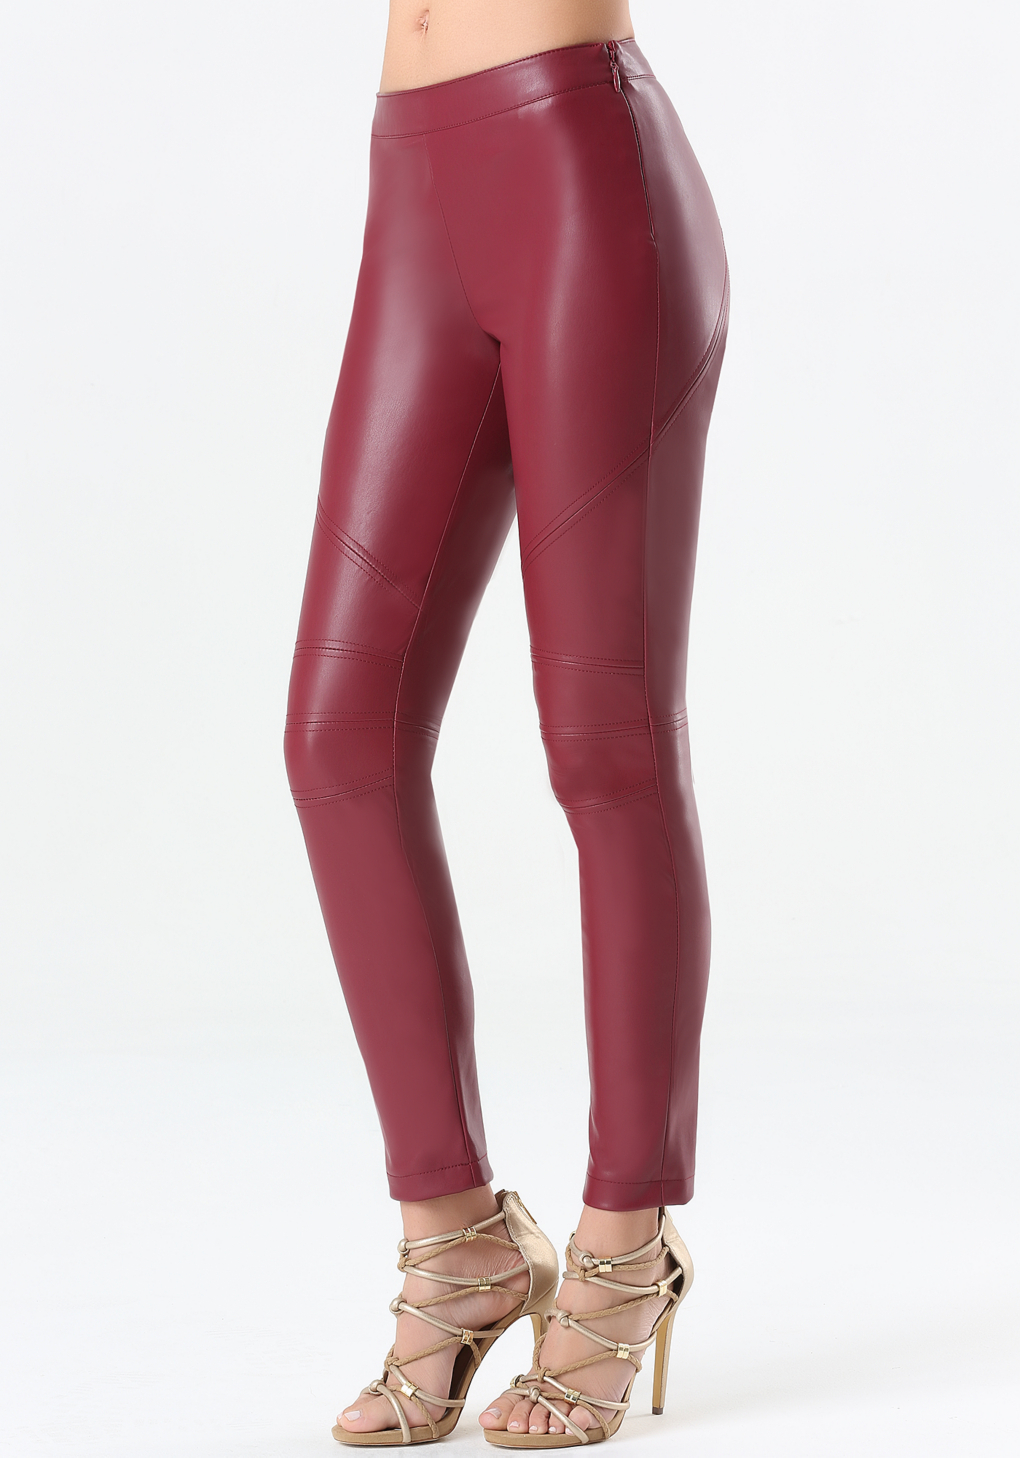 Bebe Faux Leather Leggings In Purple Cordovan Lyst